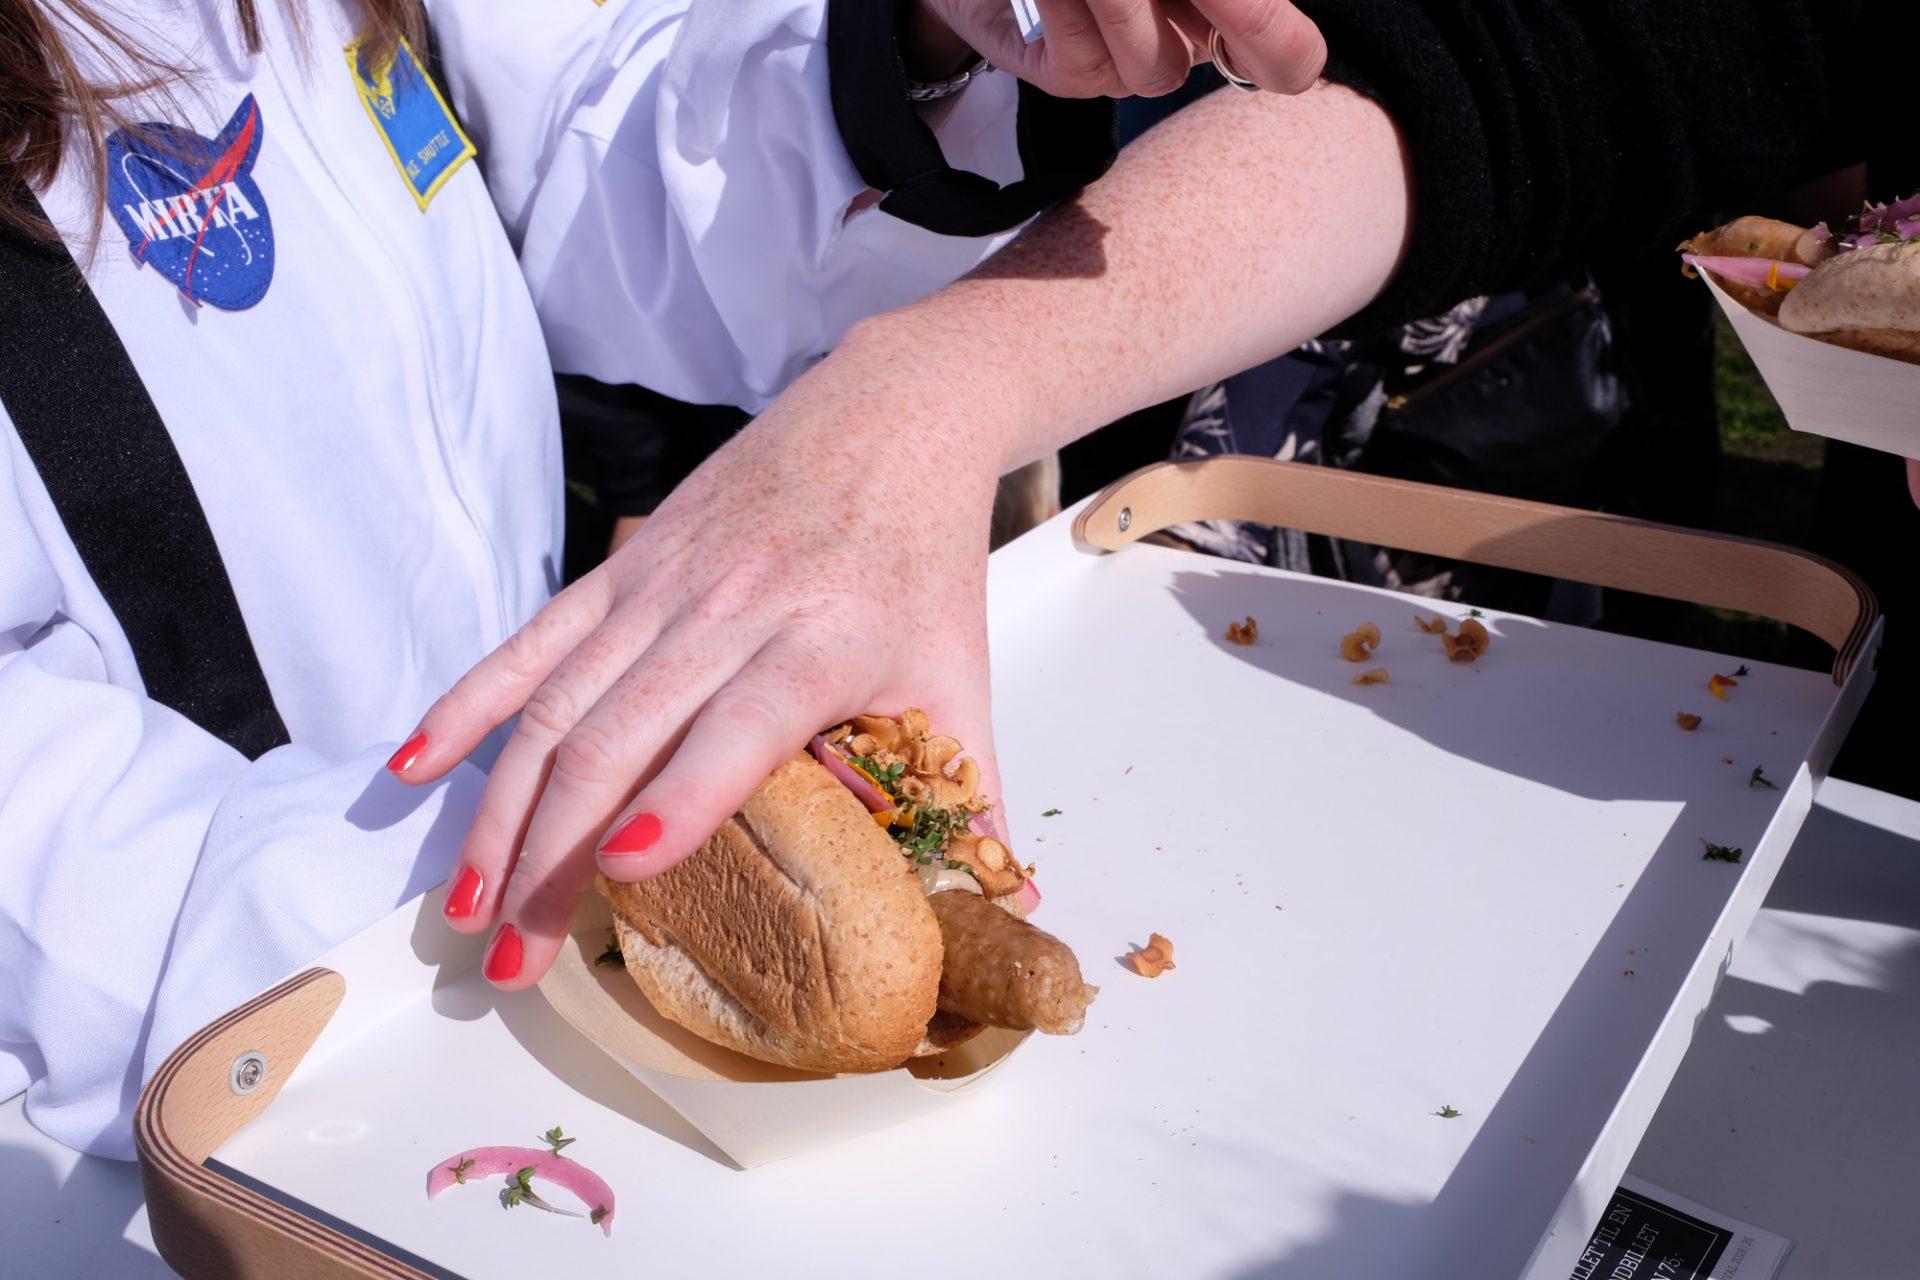 Søndag på Food Festival: Er du klar til årets Hotdog DM 2019?